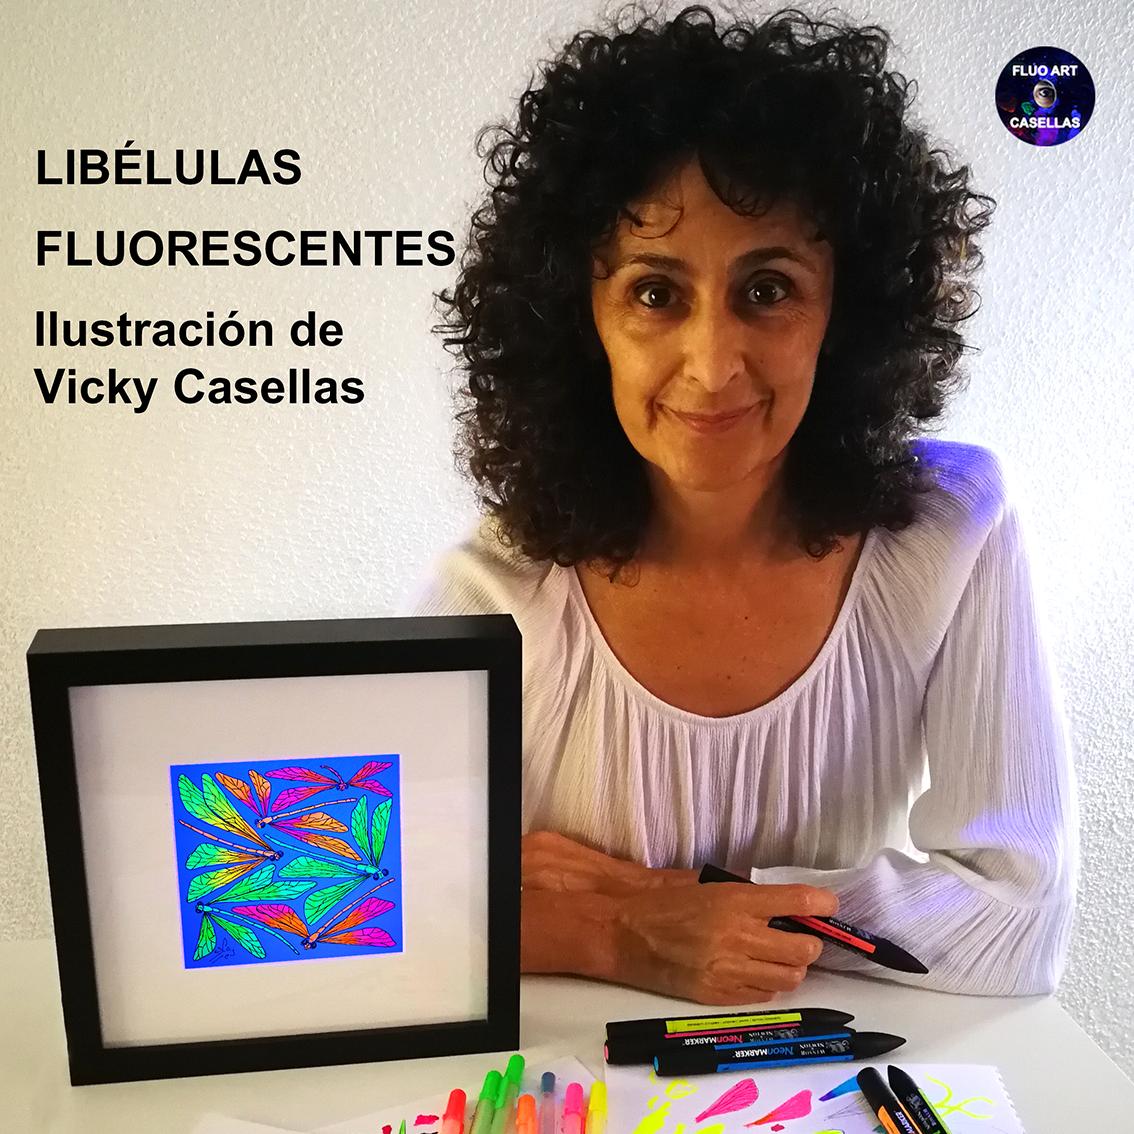 Libélulas-fluorescentes.-Ilustracion-fluorescente-Vicky-Casellas.-Arte-fluorescente.-Fluo-Art-Casellas